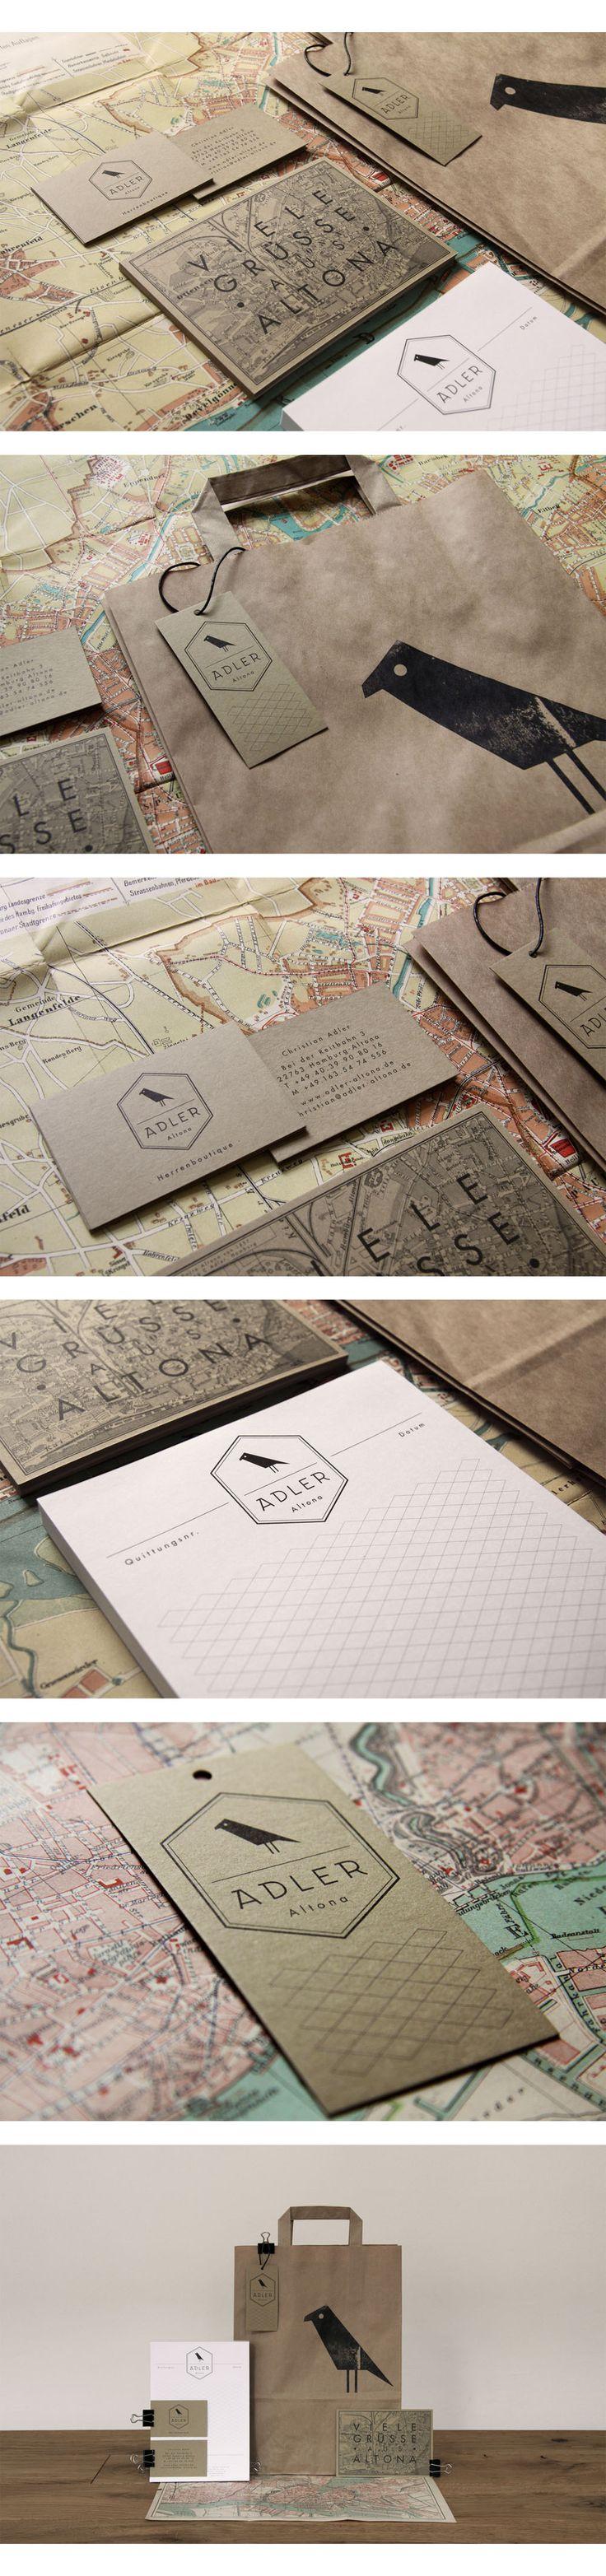 Adler Altona – Herrenboutique | #stationary #corporate #design #corporatedesign #identity #branding #marketing < repinned by www.BlickeDeeler.de | Take a look at www.LogoGestaltung-Hamburg.de